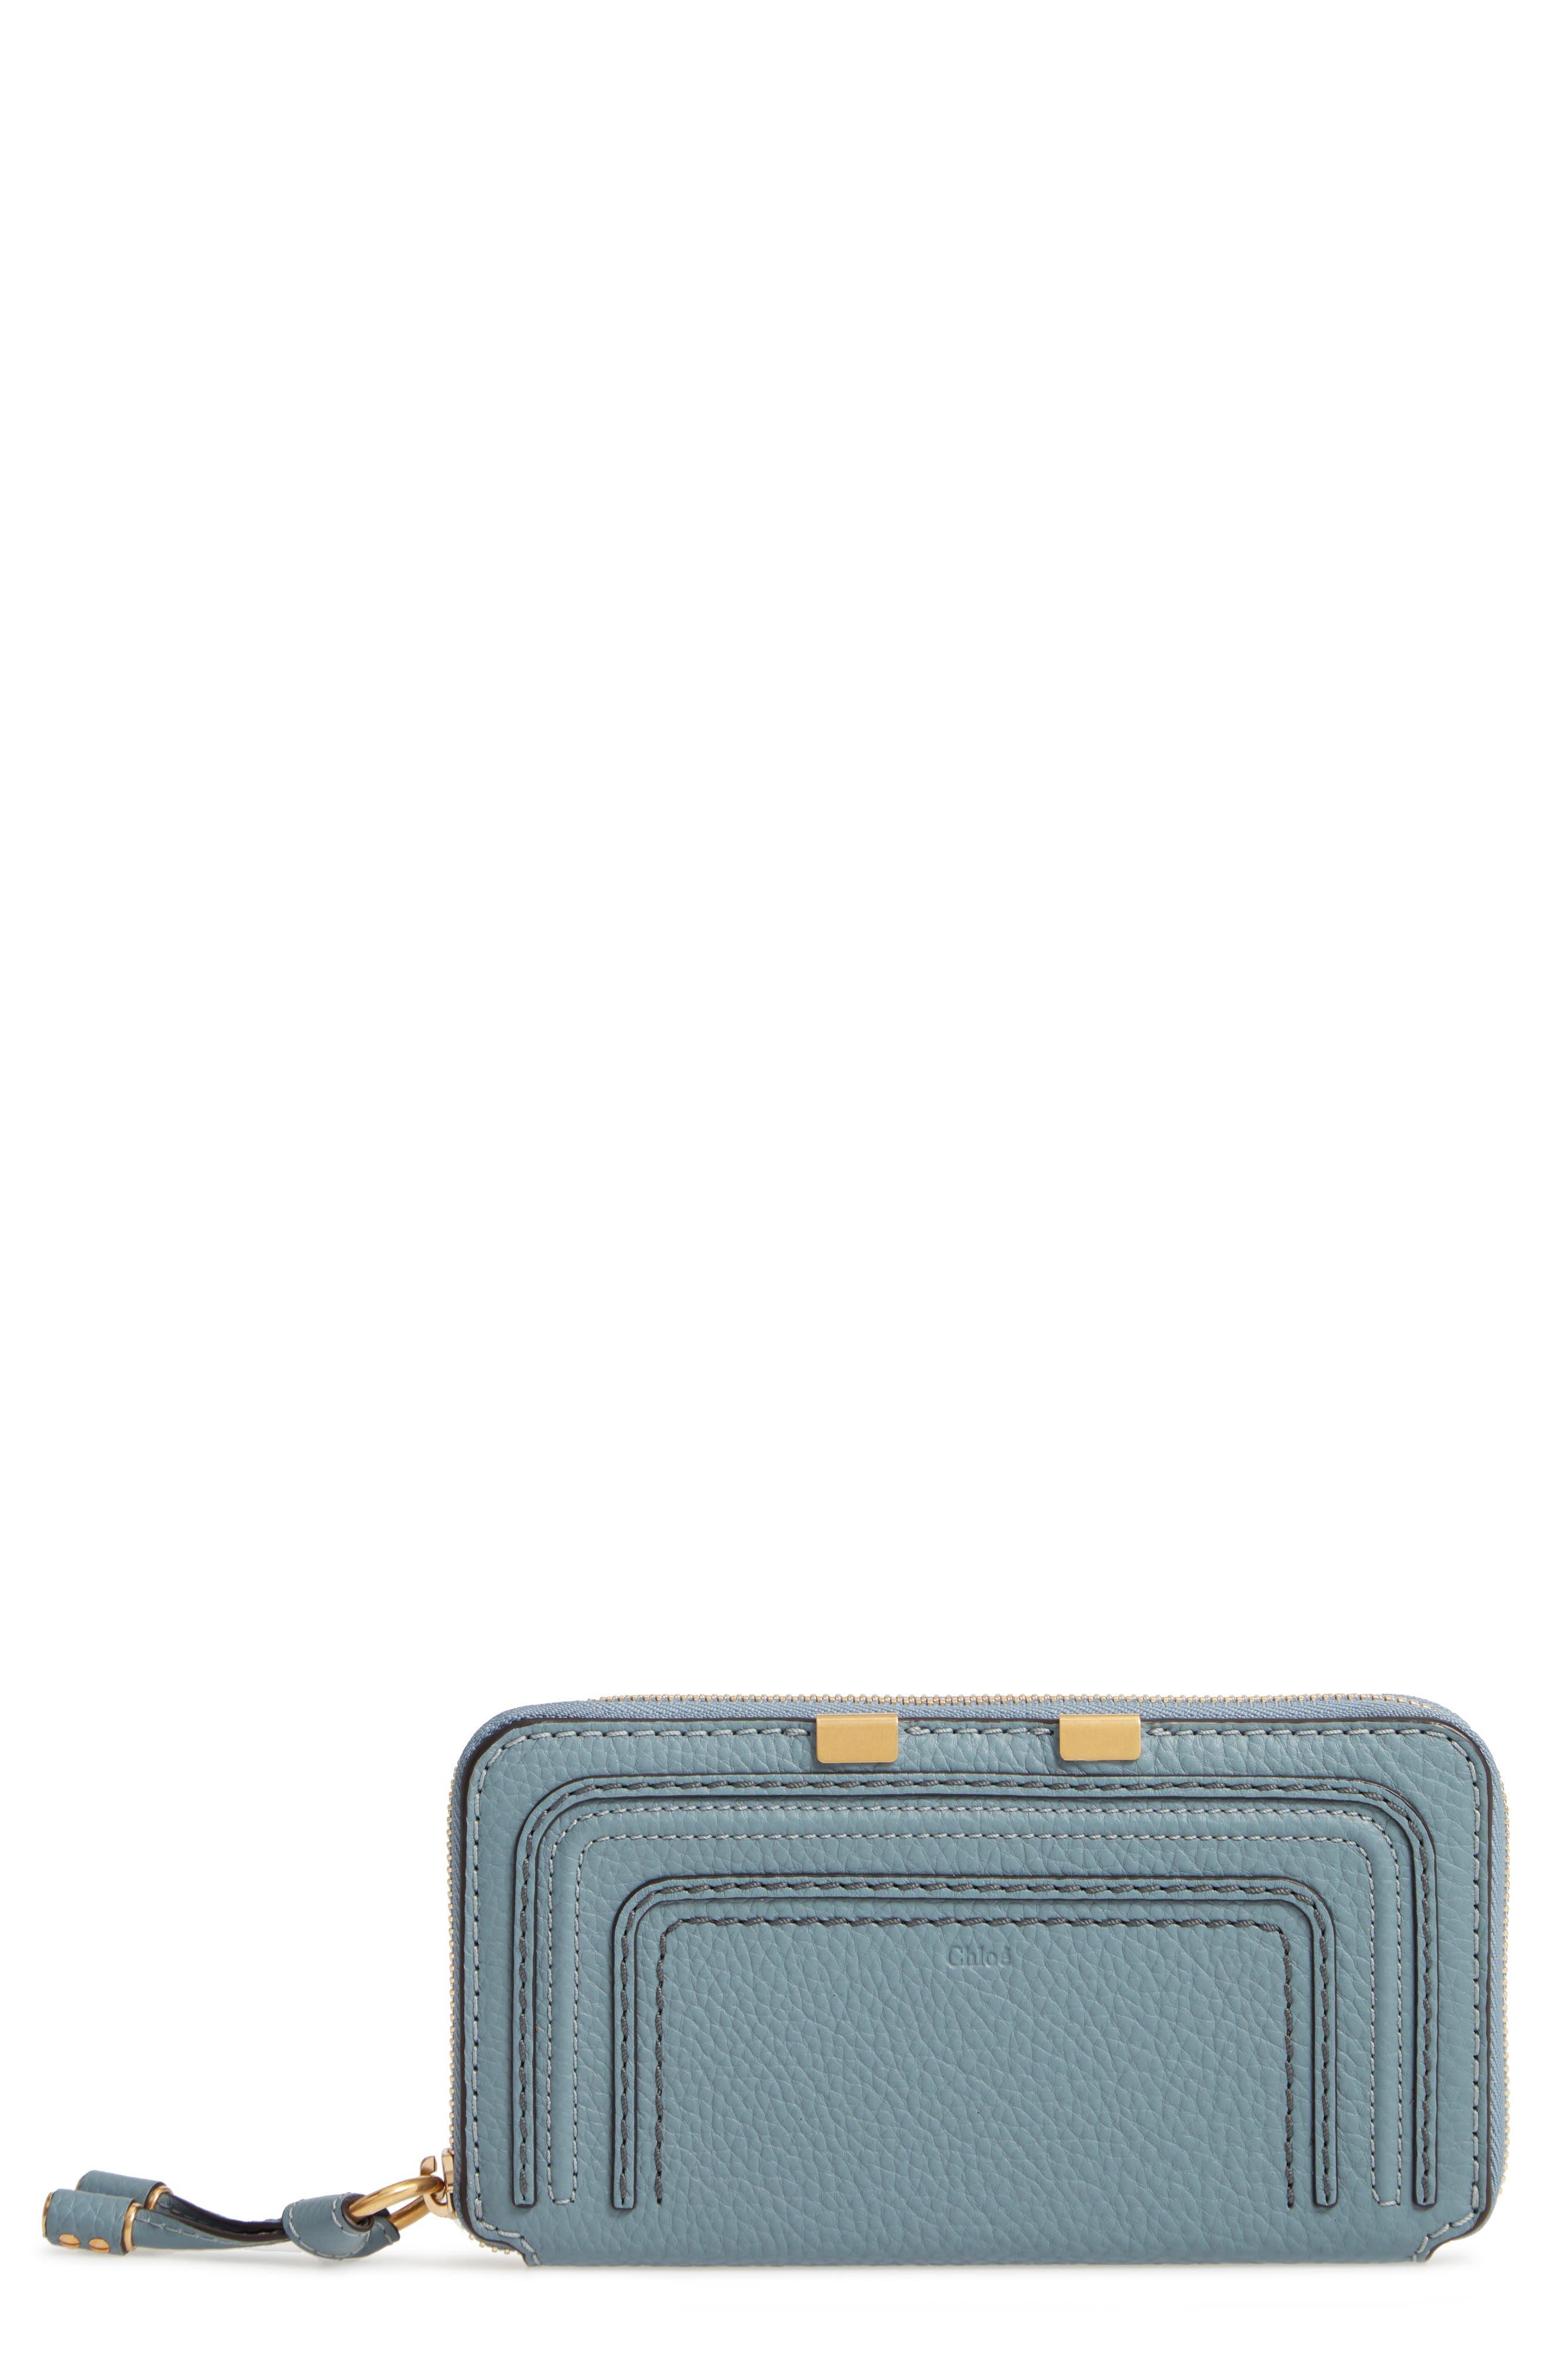 CHLOÉ, 'Marcie - Long' Zip Around Wallet, Main thumbnail 1, color, CLOUDY BLUE